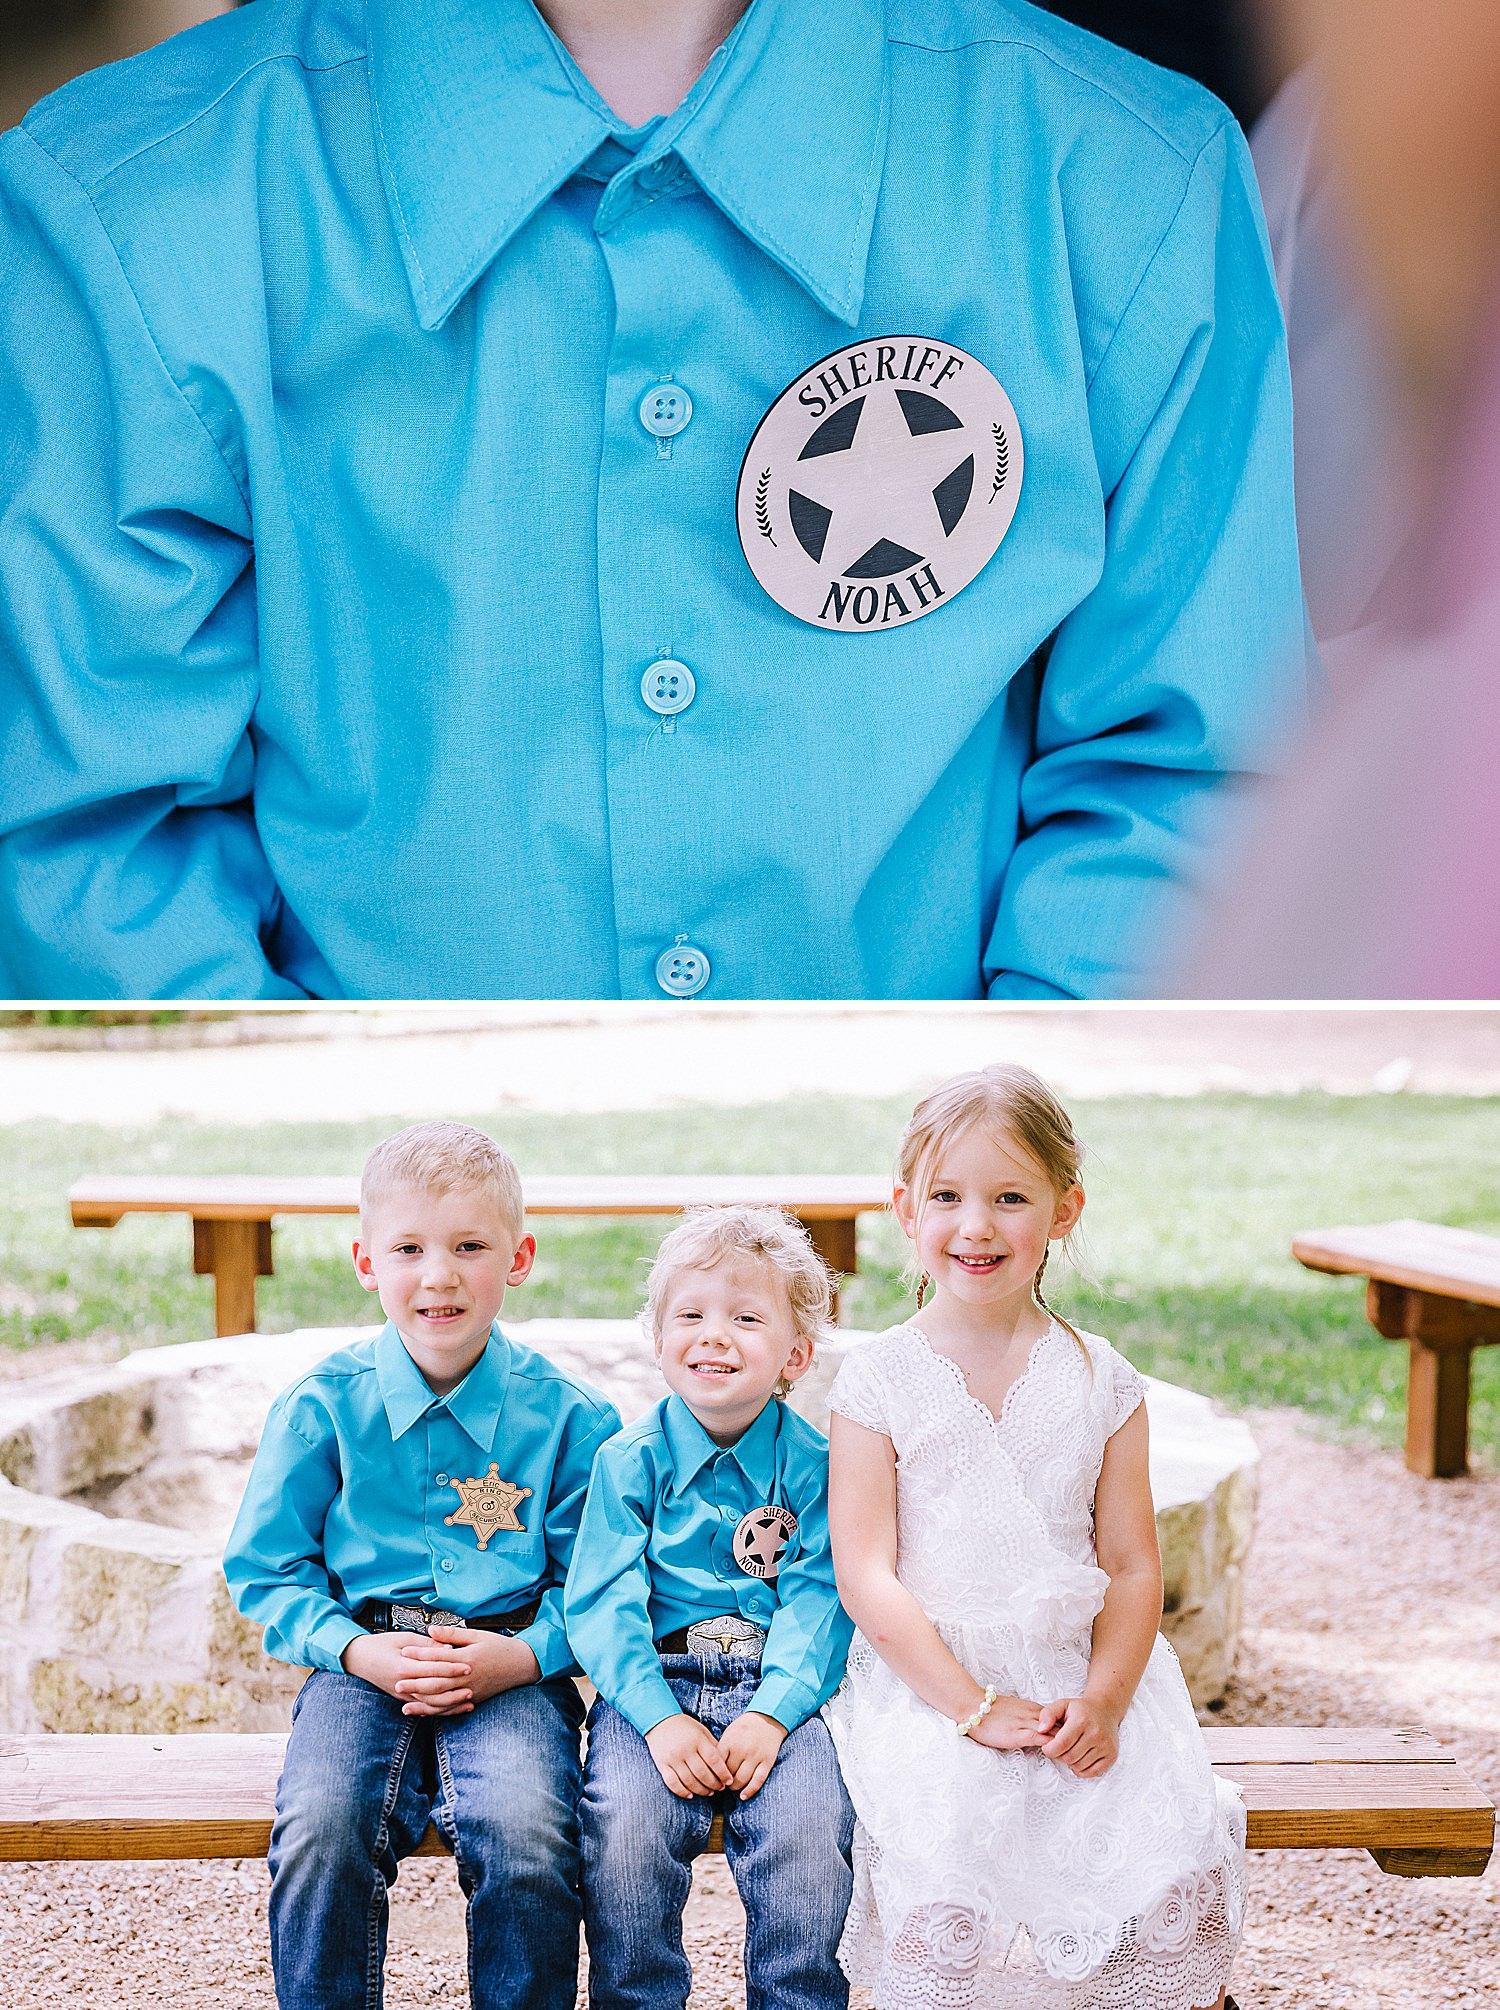 Carly-Barton-Photography-Old-Town-Texas-Rustic-Wedding-Photos-Sunflowers-Boots-Kyle-Texas_0021.jpg